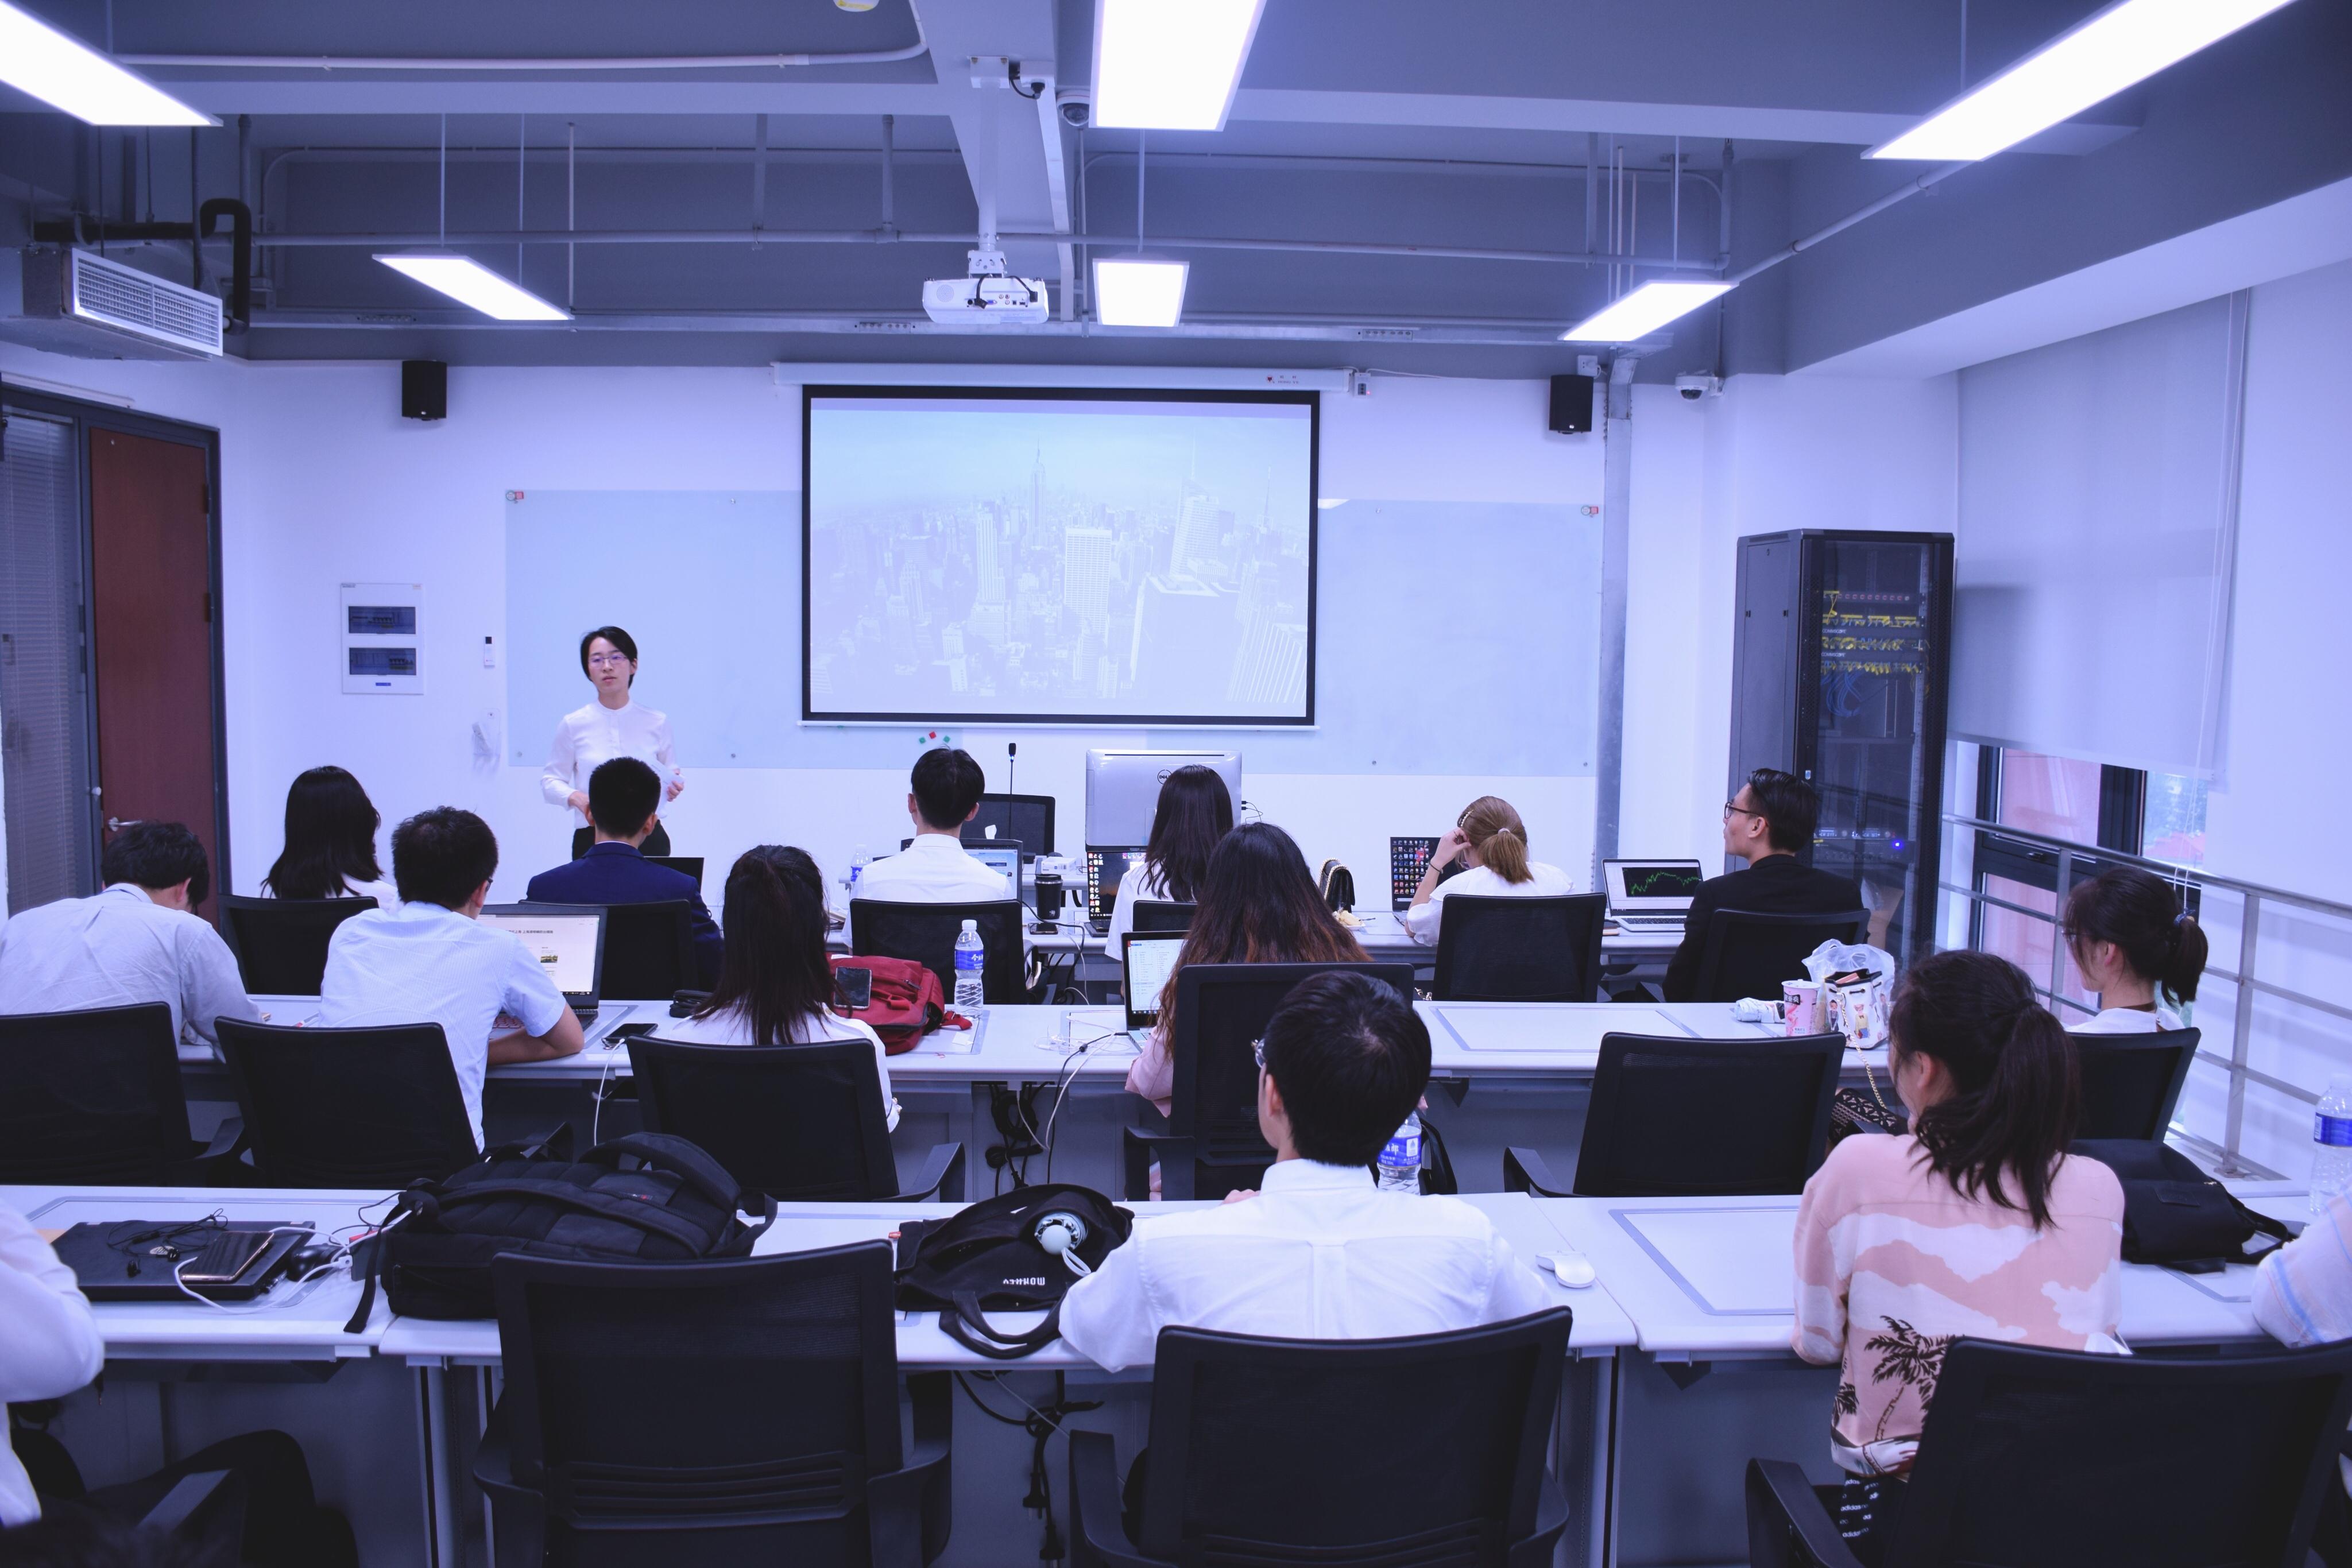 WESTARTIN浪潮_上海金融科技独角兽实训_上海)授权实习机会_背景提升必选金融实习项目